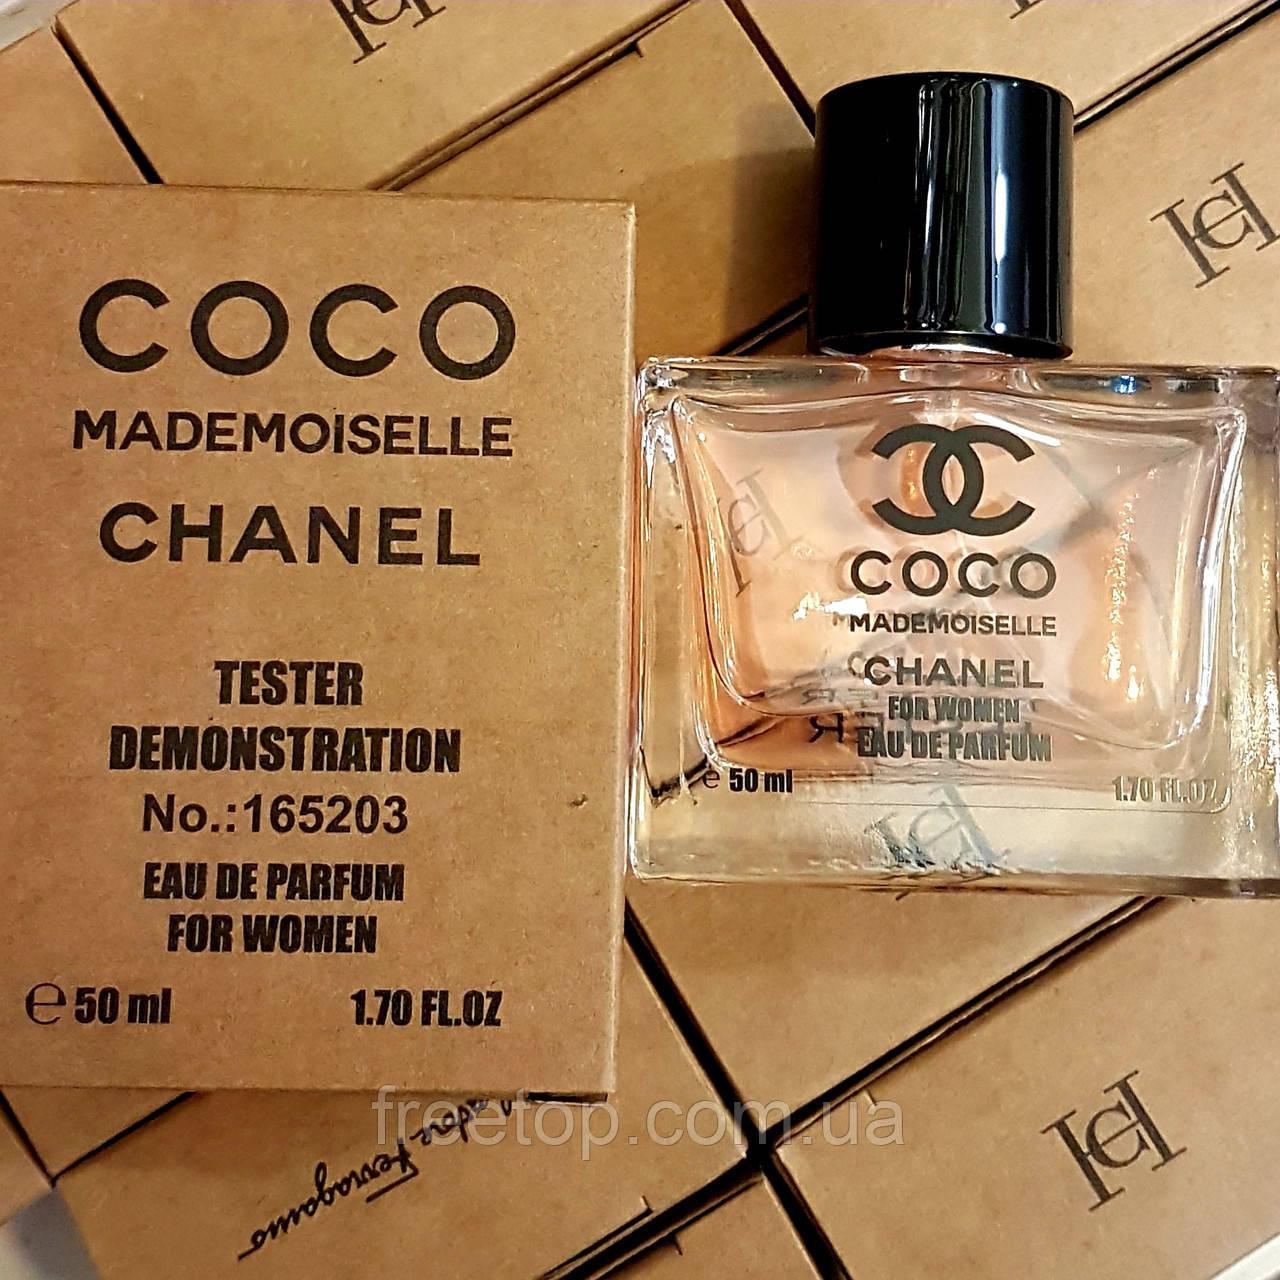 Тестер Chanel Coco Mademoiselle женские (Шанель Коко Мадмуазель), 50 мл (лицензия ОАЭ)